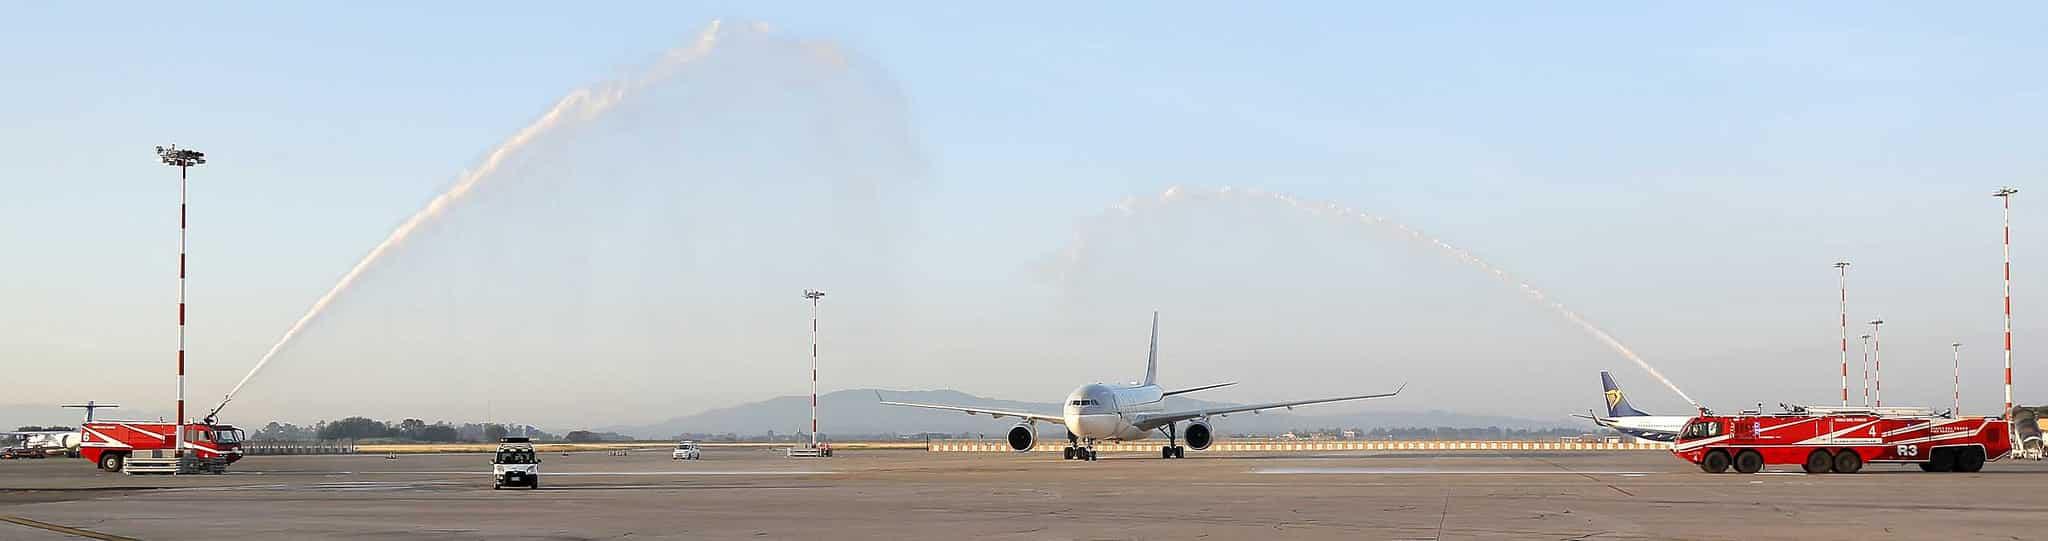 Doha-Pisa-Qatar-Airways-salutul-apa